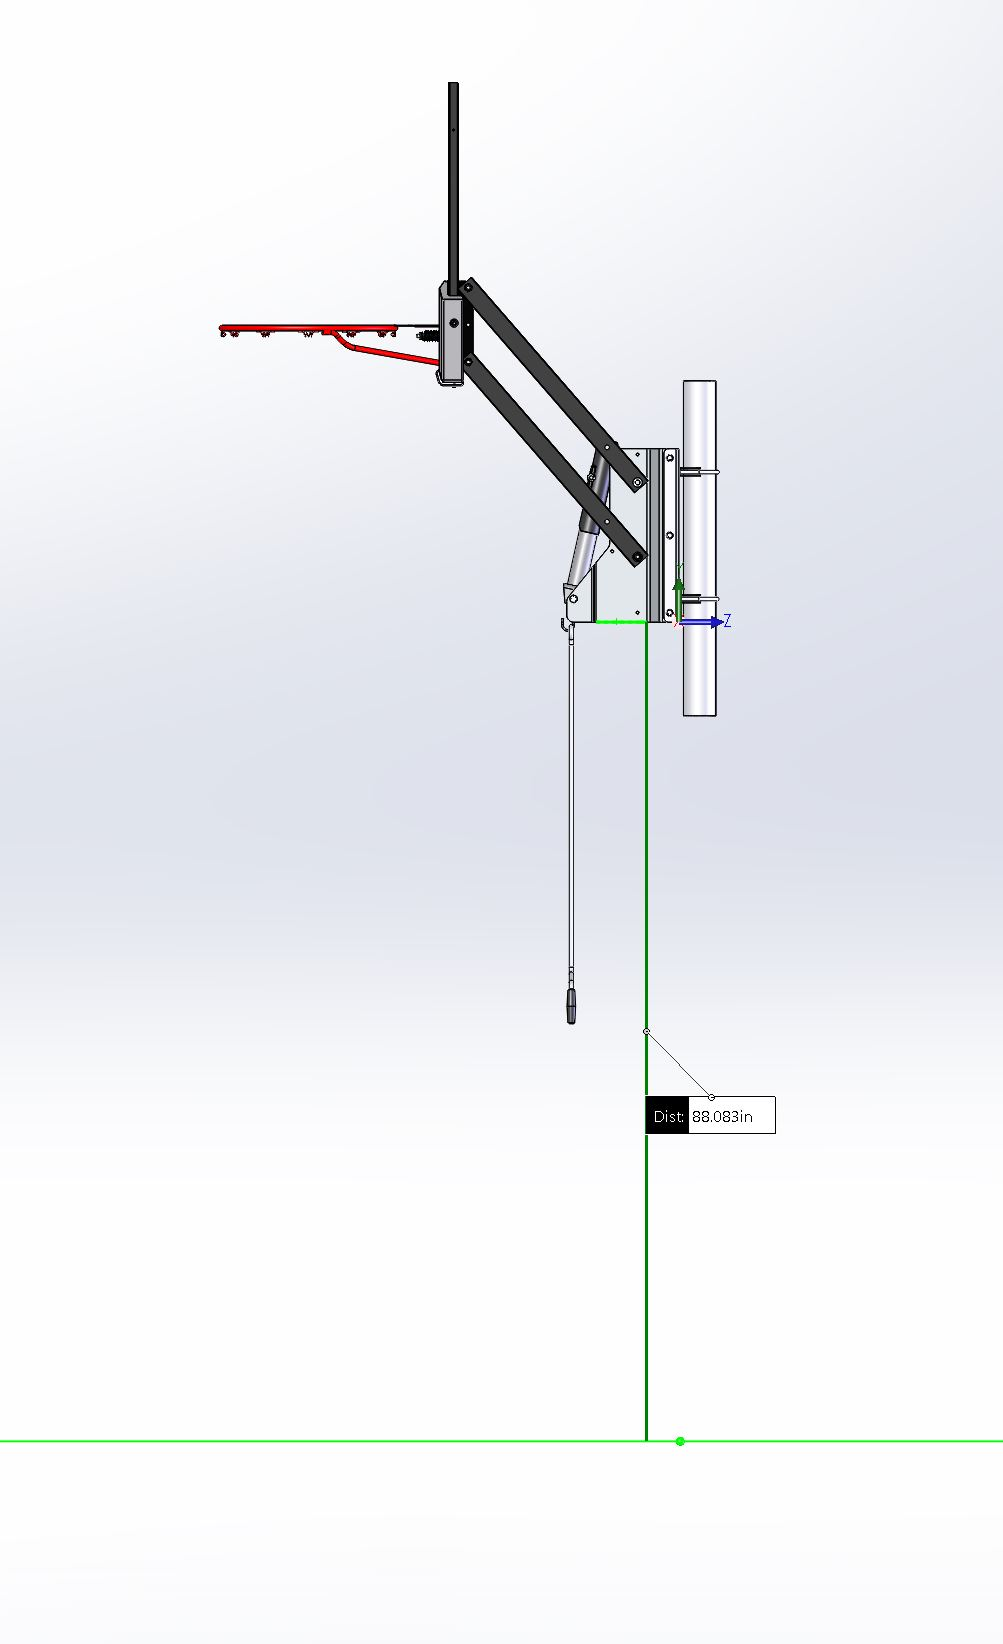 Spalding 316 U Turn Bracket Kit For 4 Quot Square Poles On